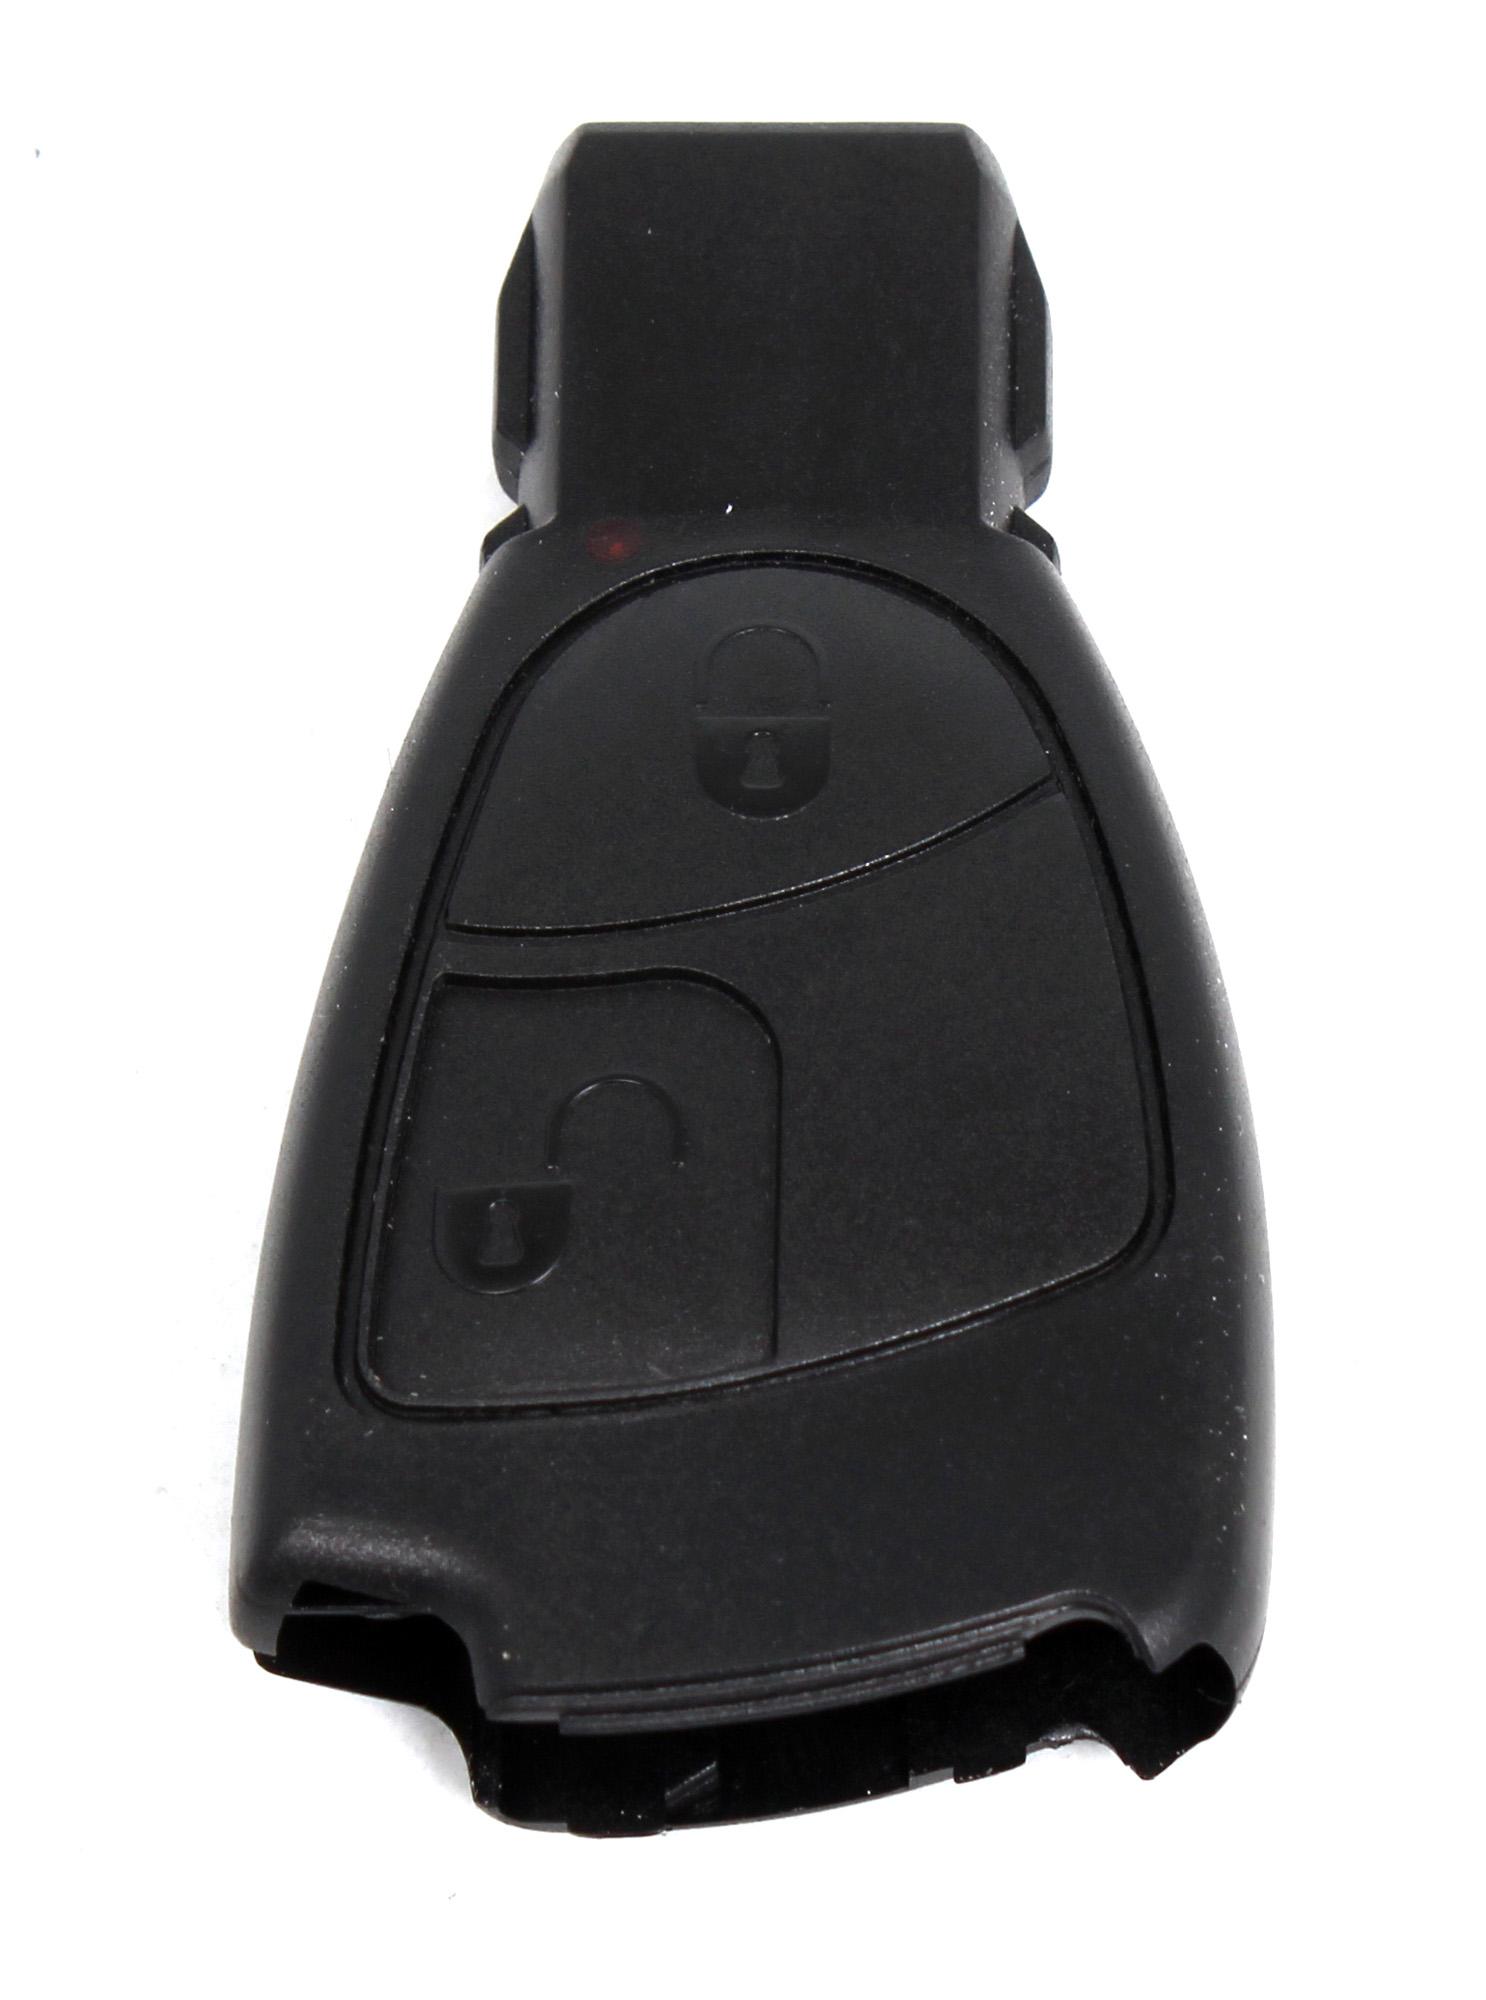 1x Schlüsselgehäuse 2-Tasten MERCEDES A-/C-/E-Klasse W168 W202 W203 W210 W211